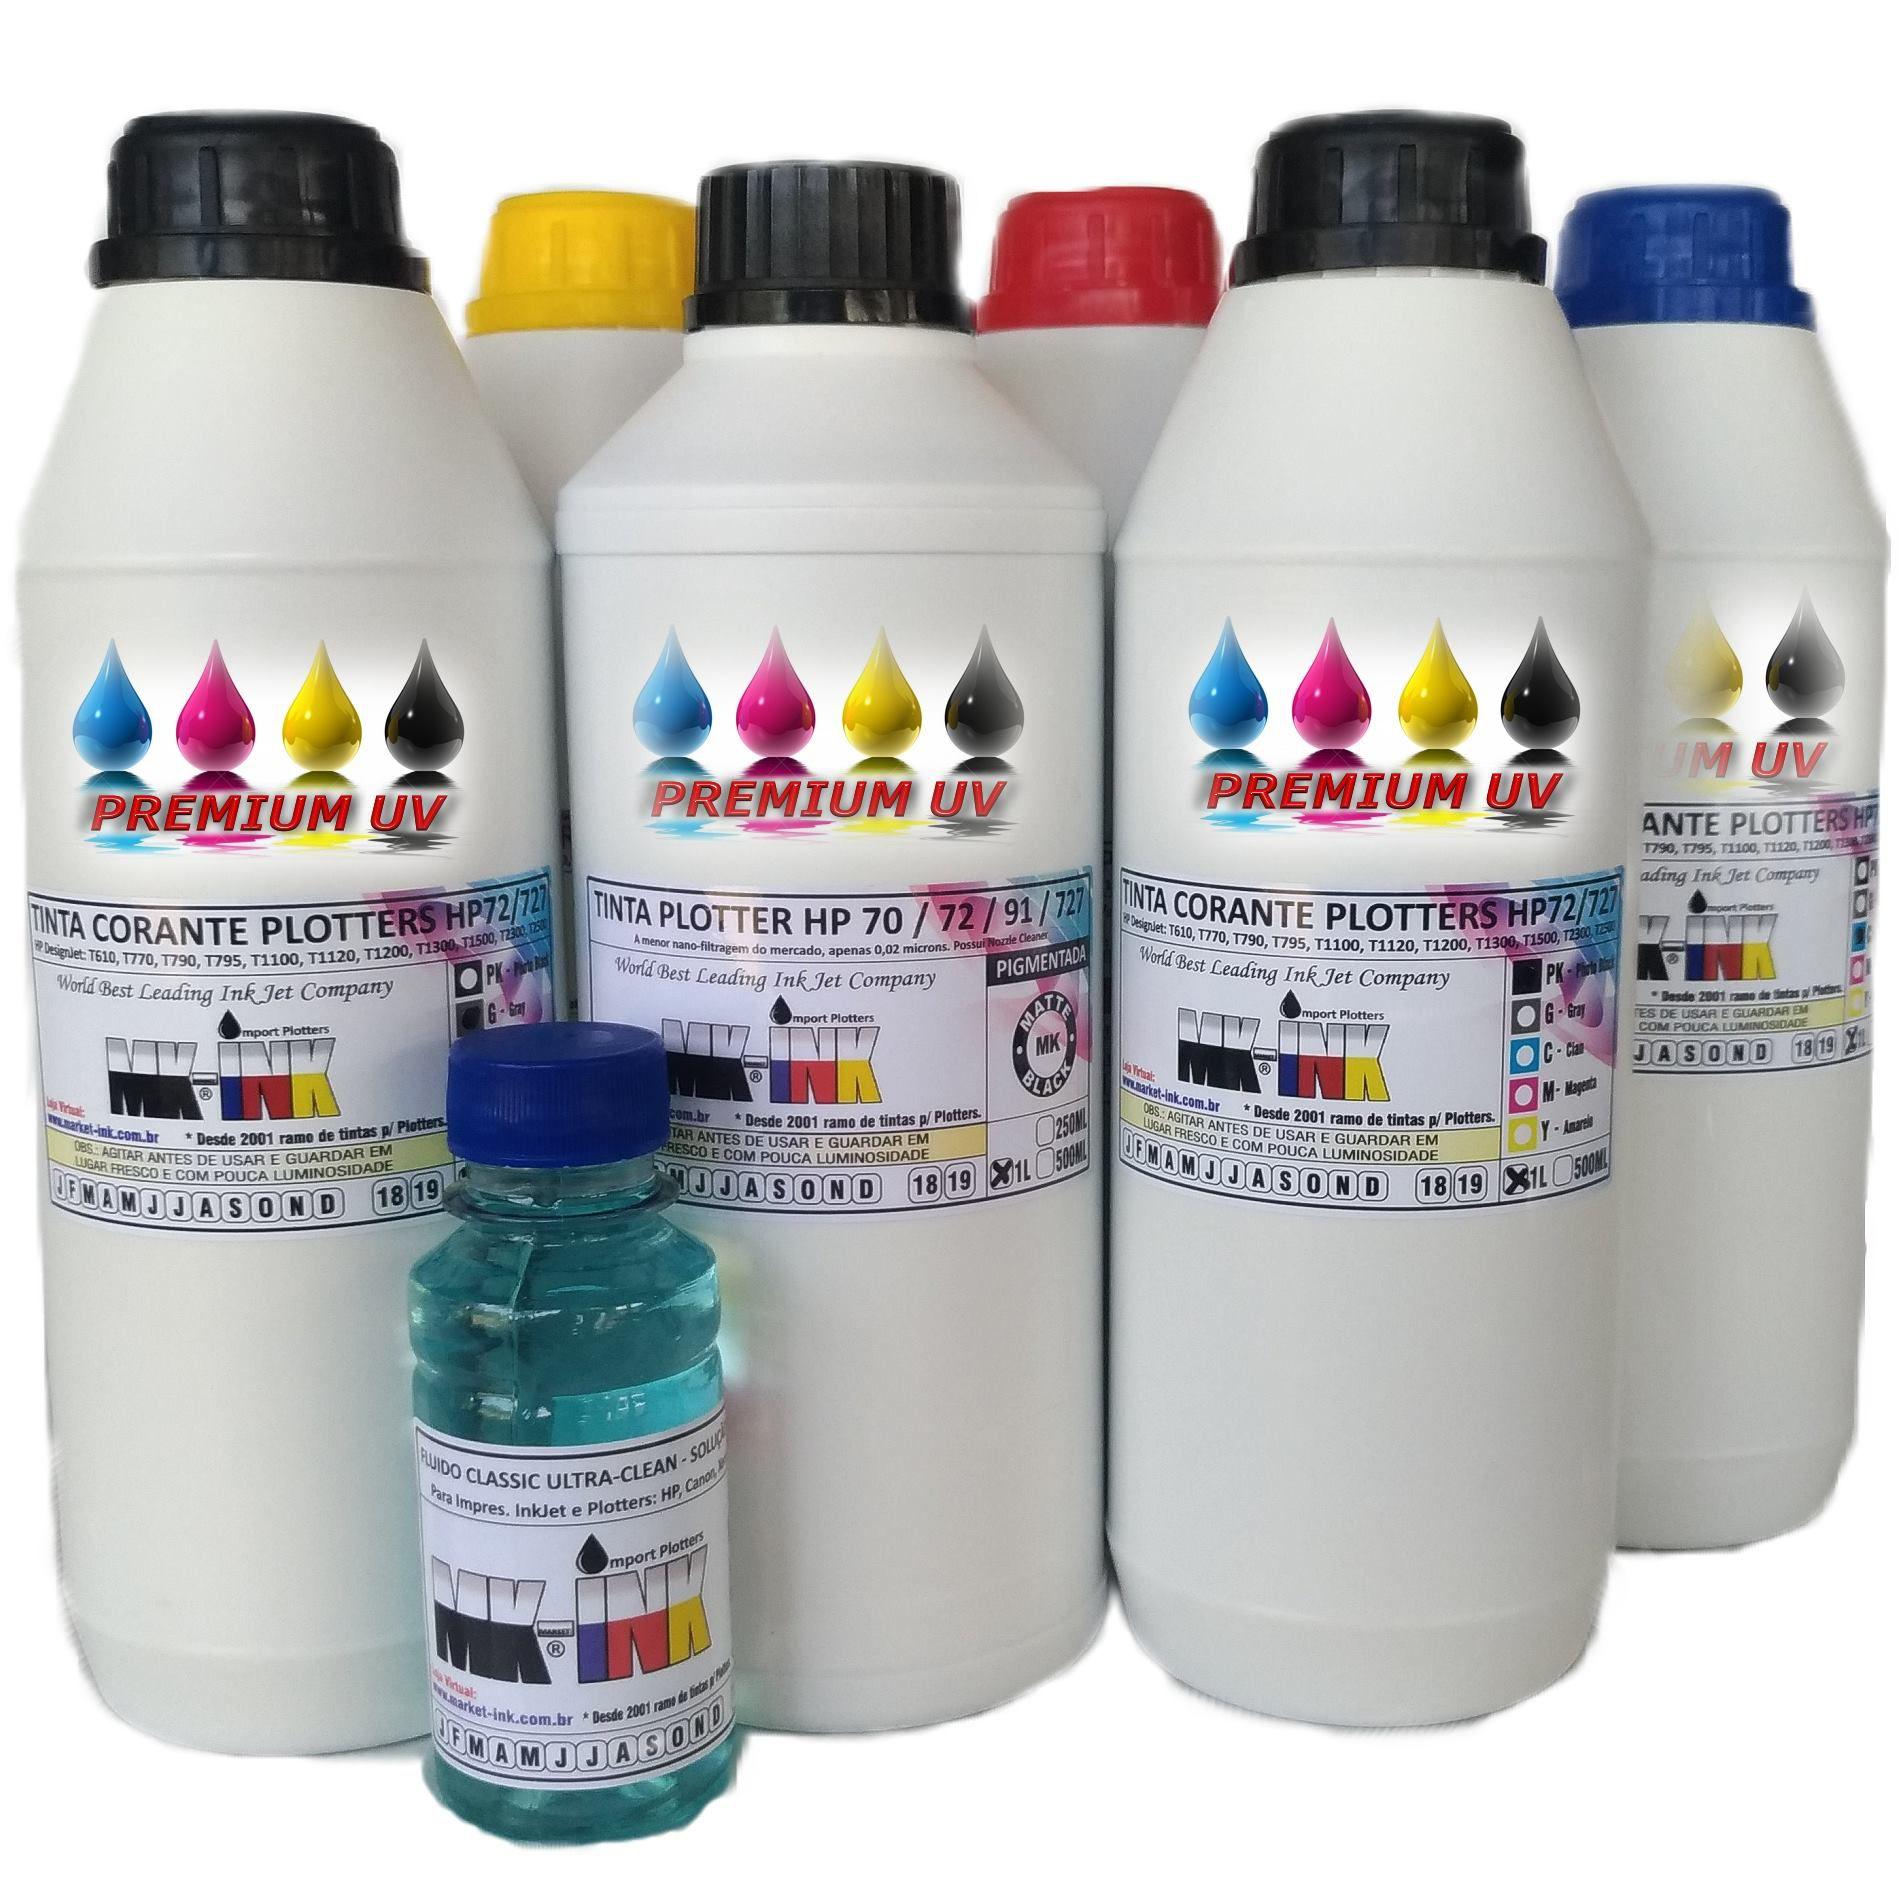 Jogo 6 litros Tinta Premium UV 6 cores Plotter código HP72, HP727 exclusiva p/ Plotter HP T610, T770, T790, T795,T920, T1100, T1120, T1200, T1300, T1500, T2300, T2500